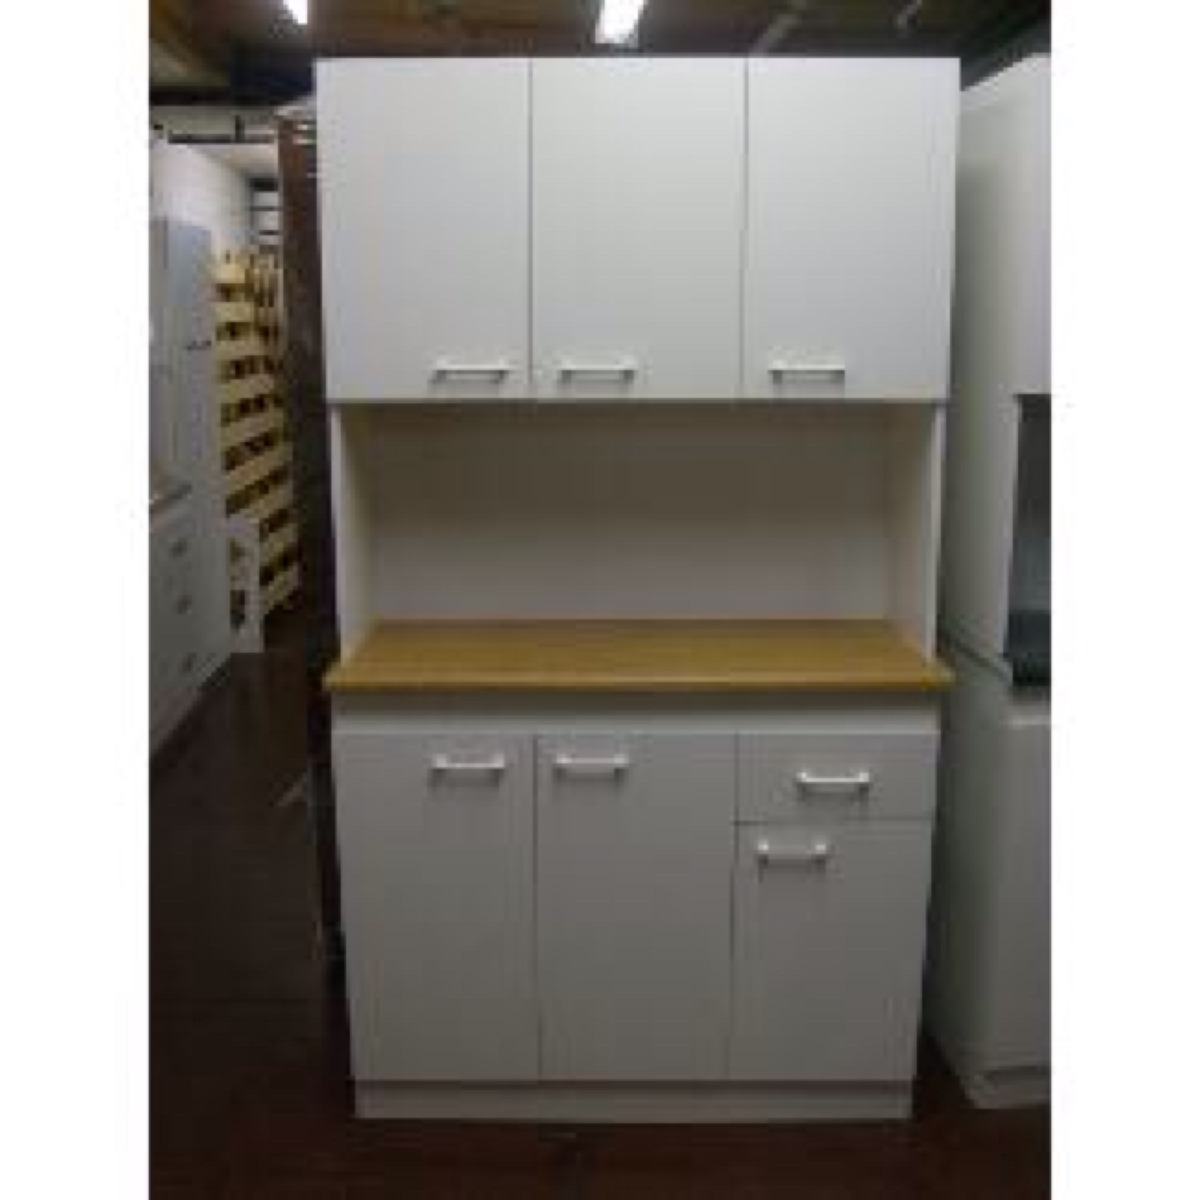 Mueble cocina compacto en mercado libre for Muebles de cocina para montar